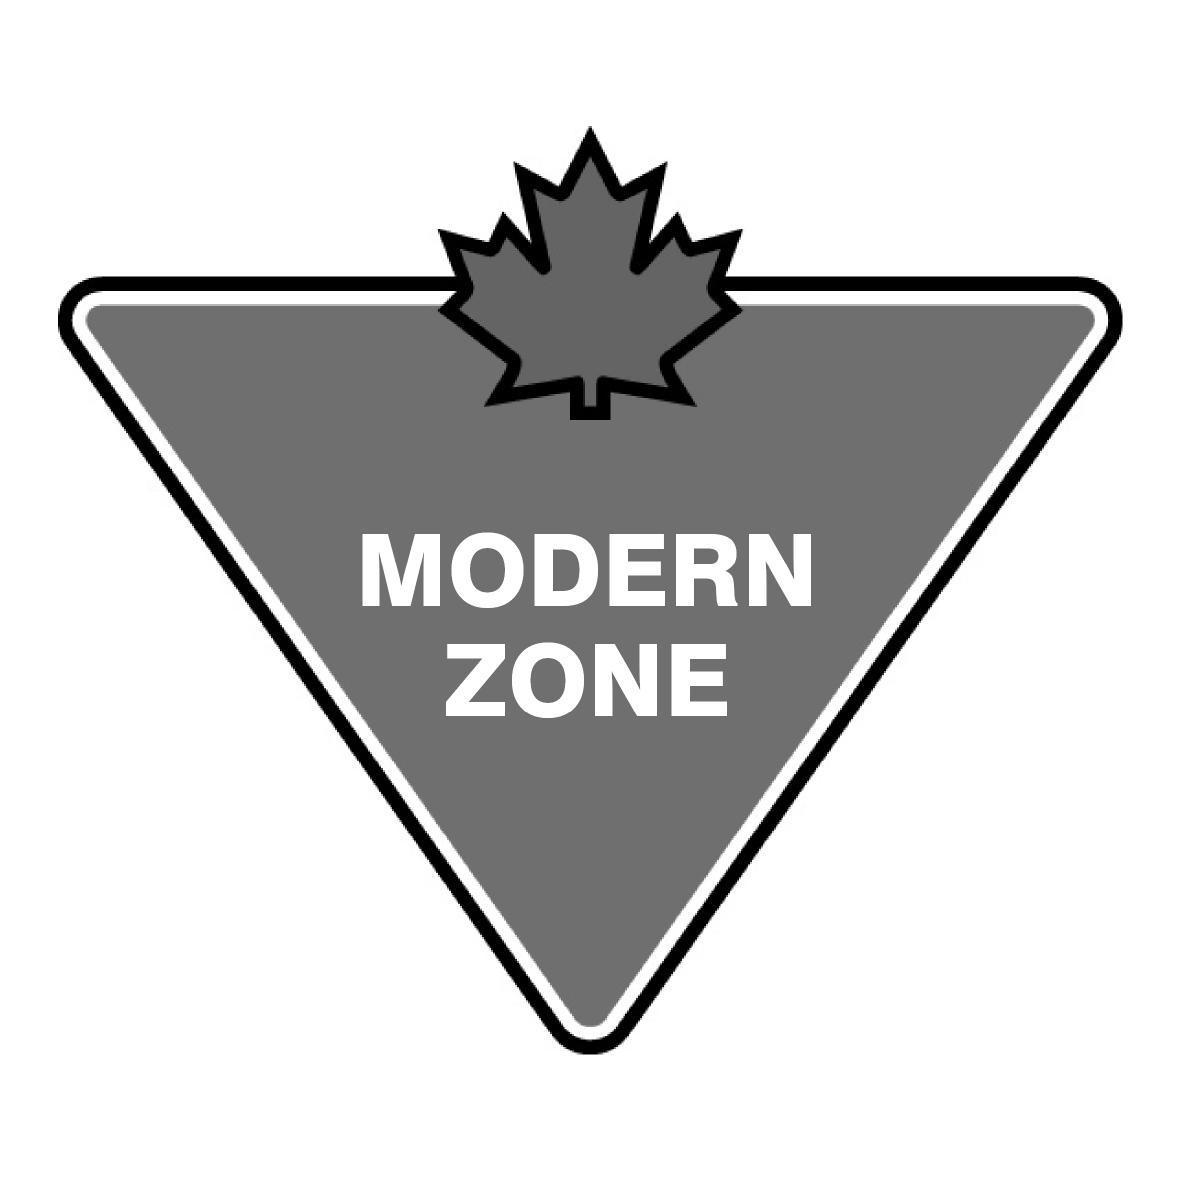 MODERN ZONE